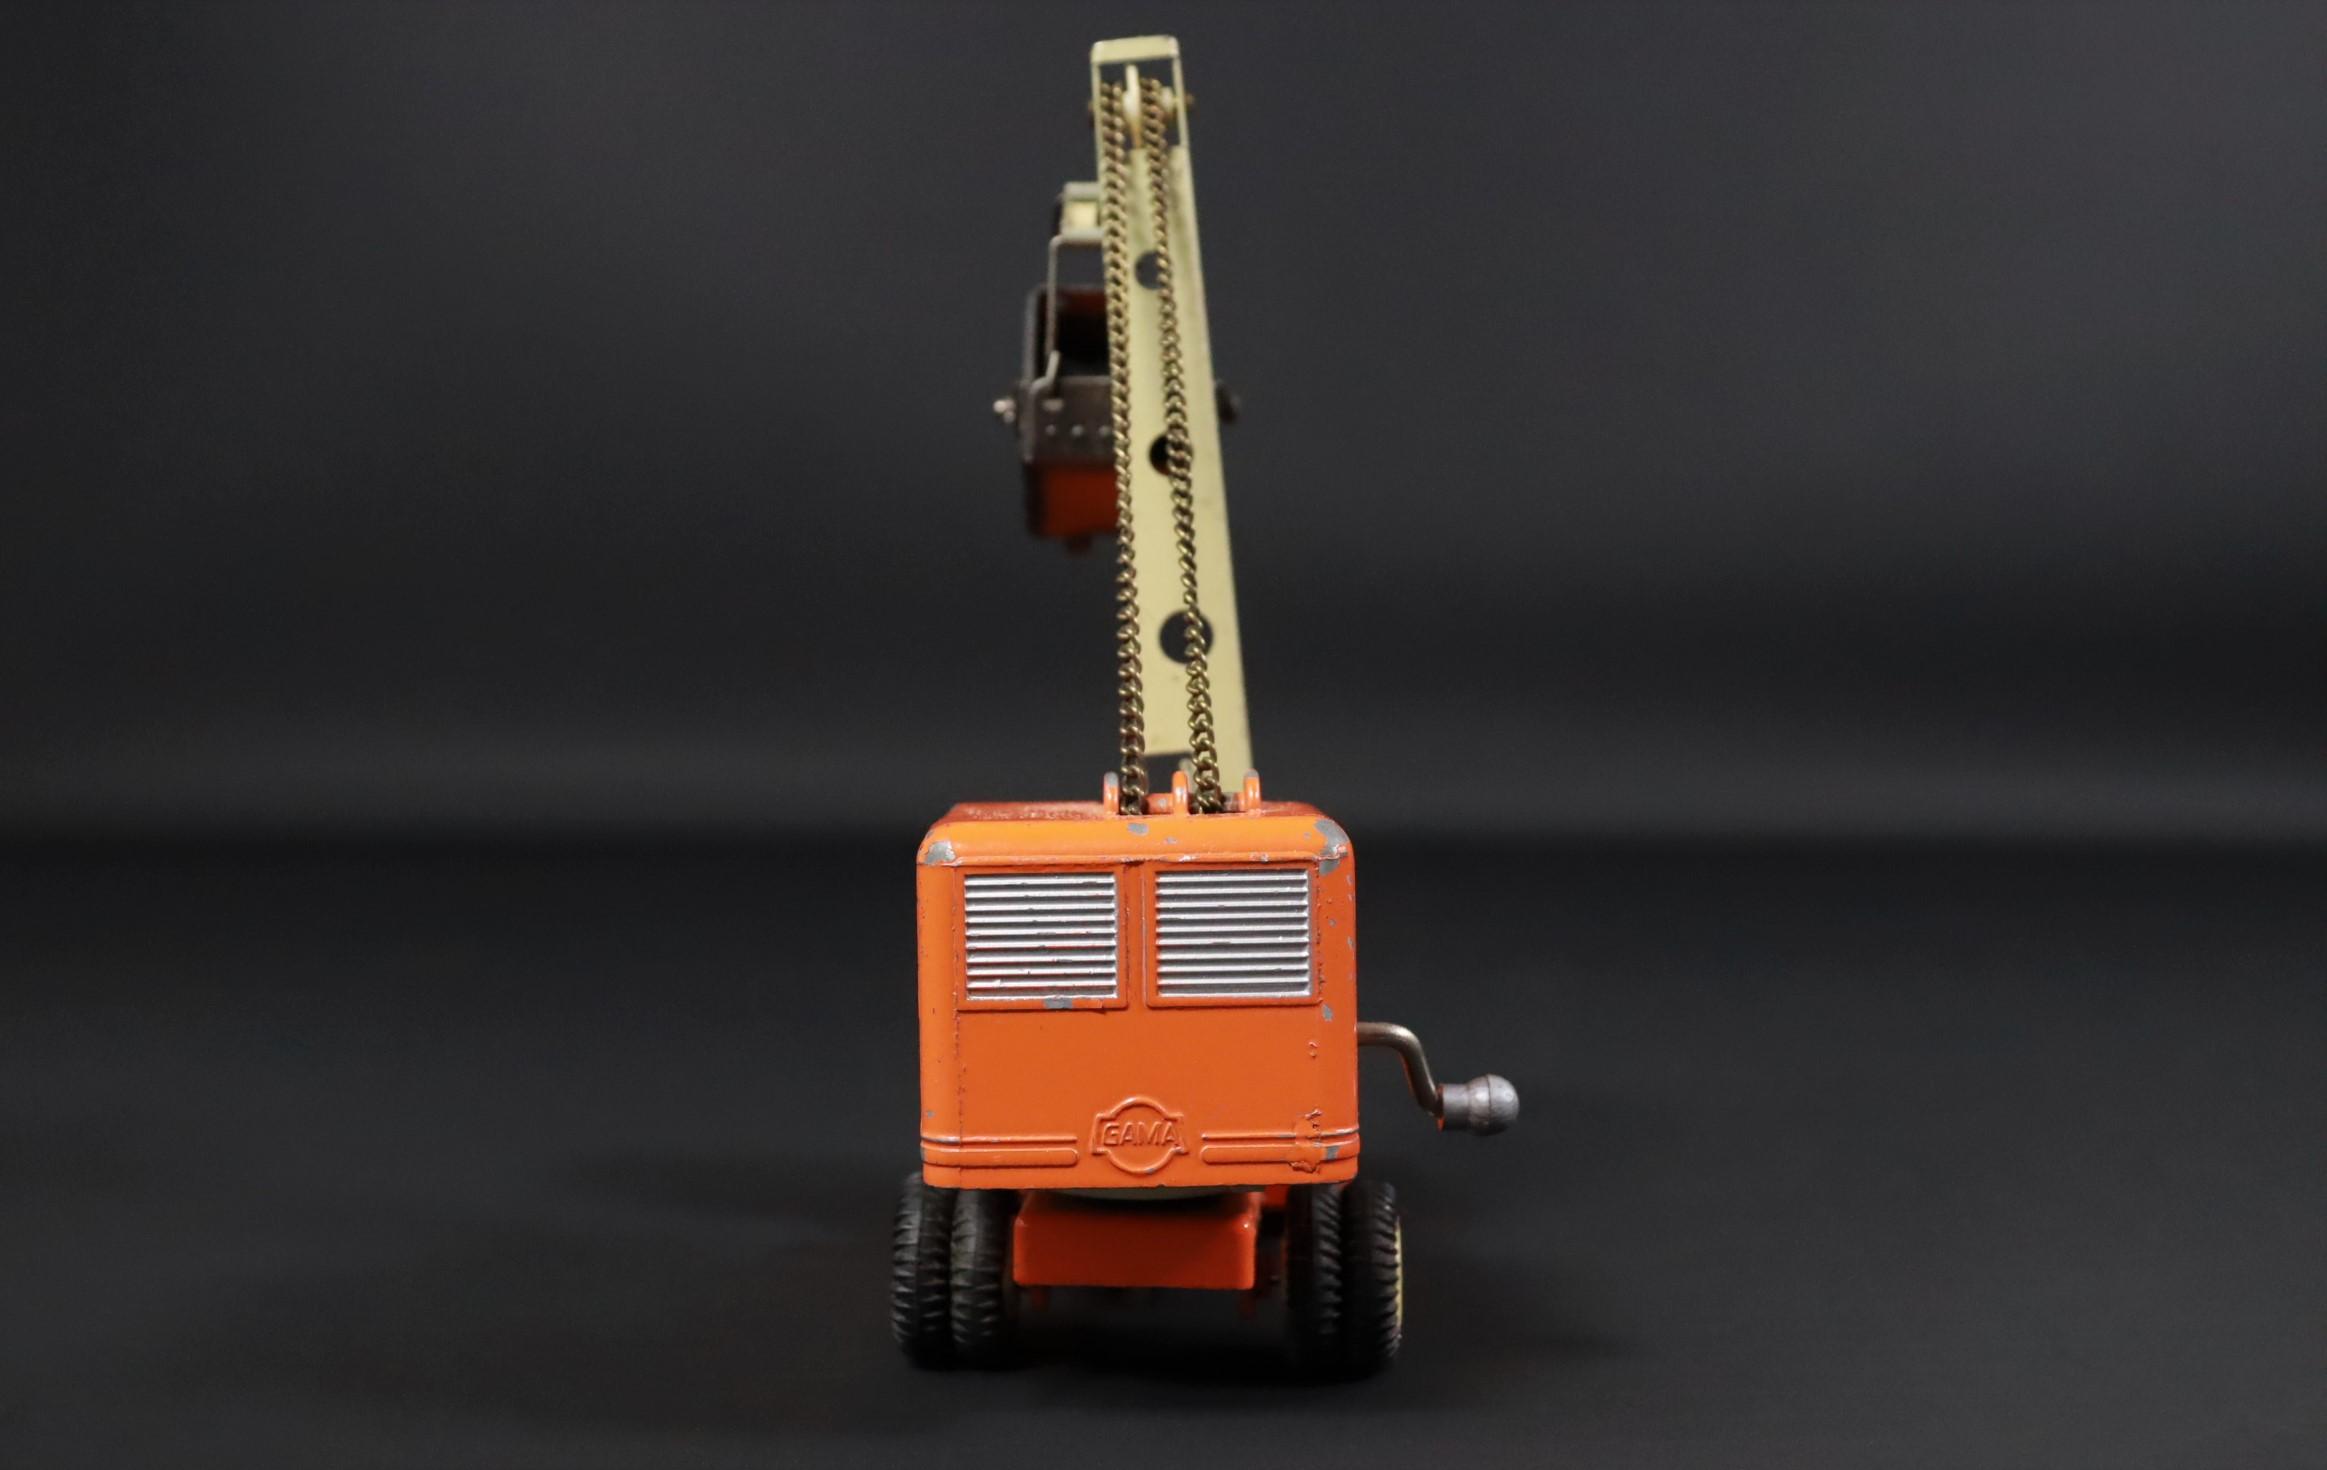 Gama / Kranwagen / LKW / orange / Modellauto #U2 4